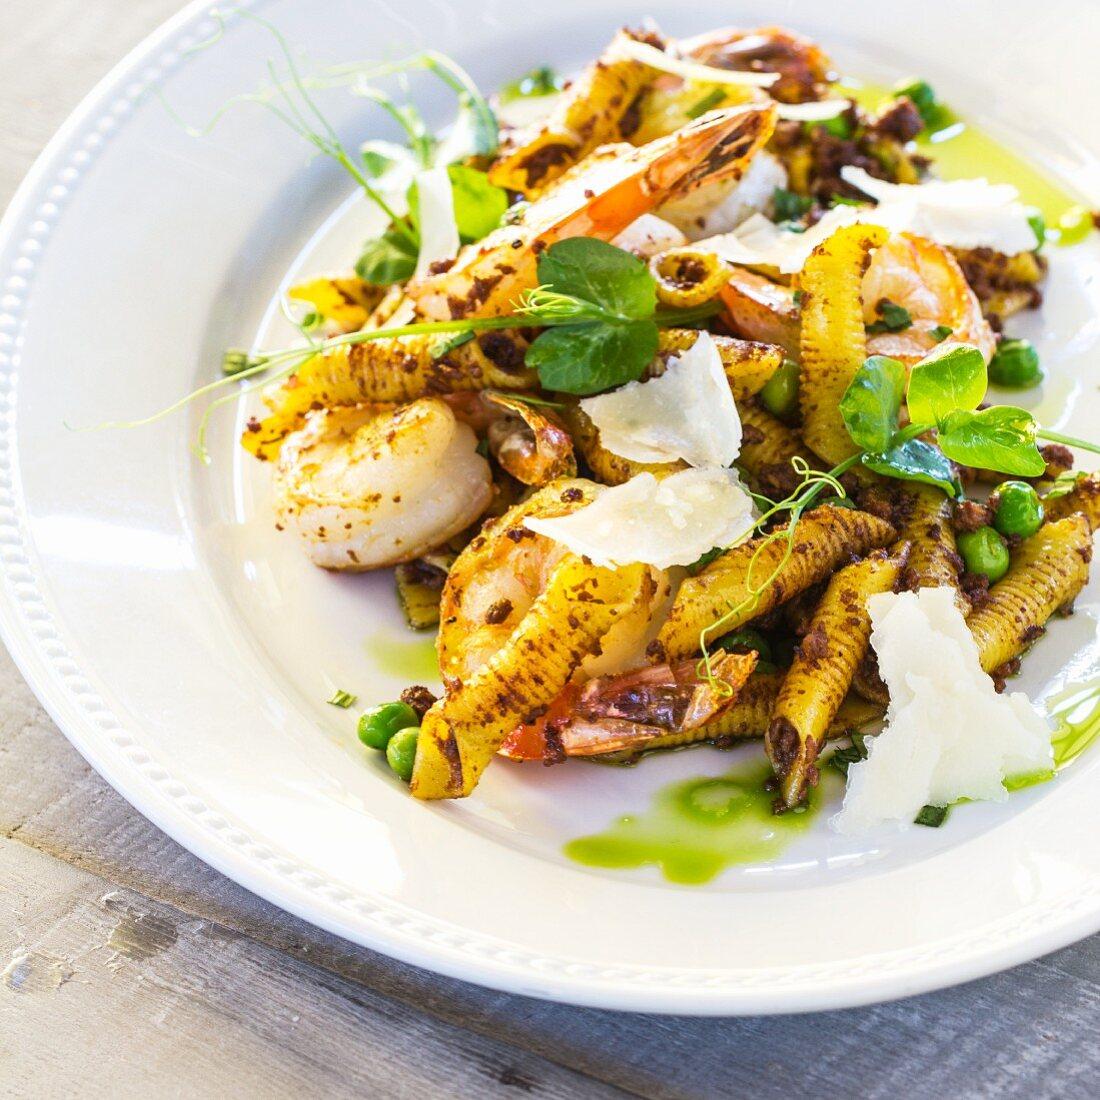 Garganelli pasta, beef chili and garlic shrimp